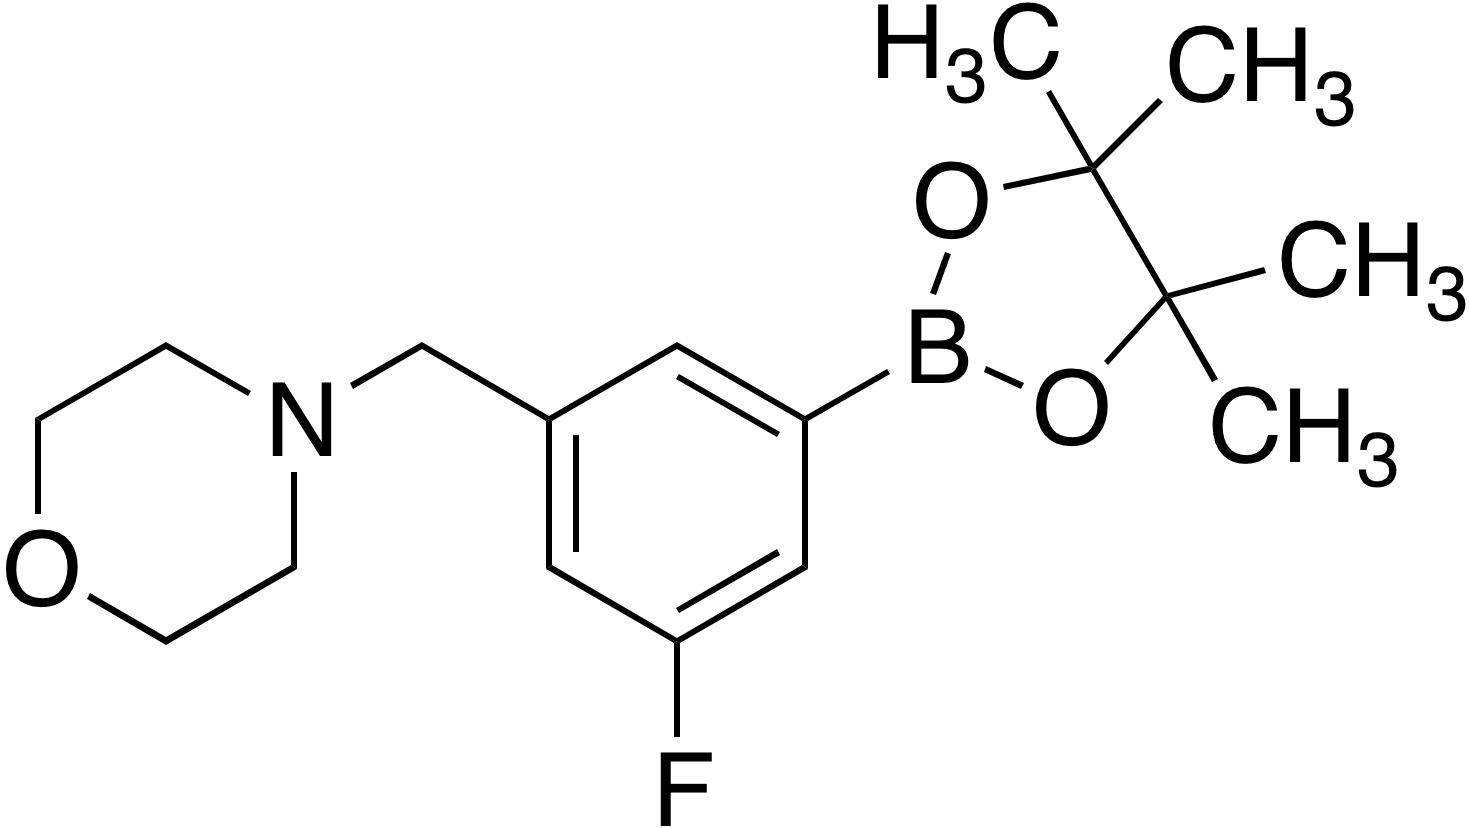 3-Fluoro-5-(4-morpholinylmethyl)benzeneboronic acid pinacol ester